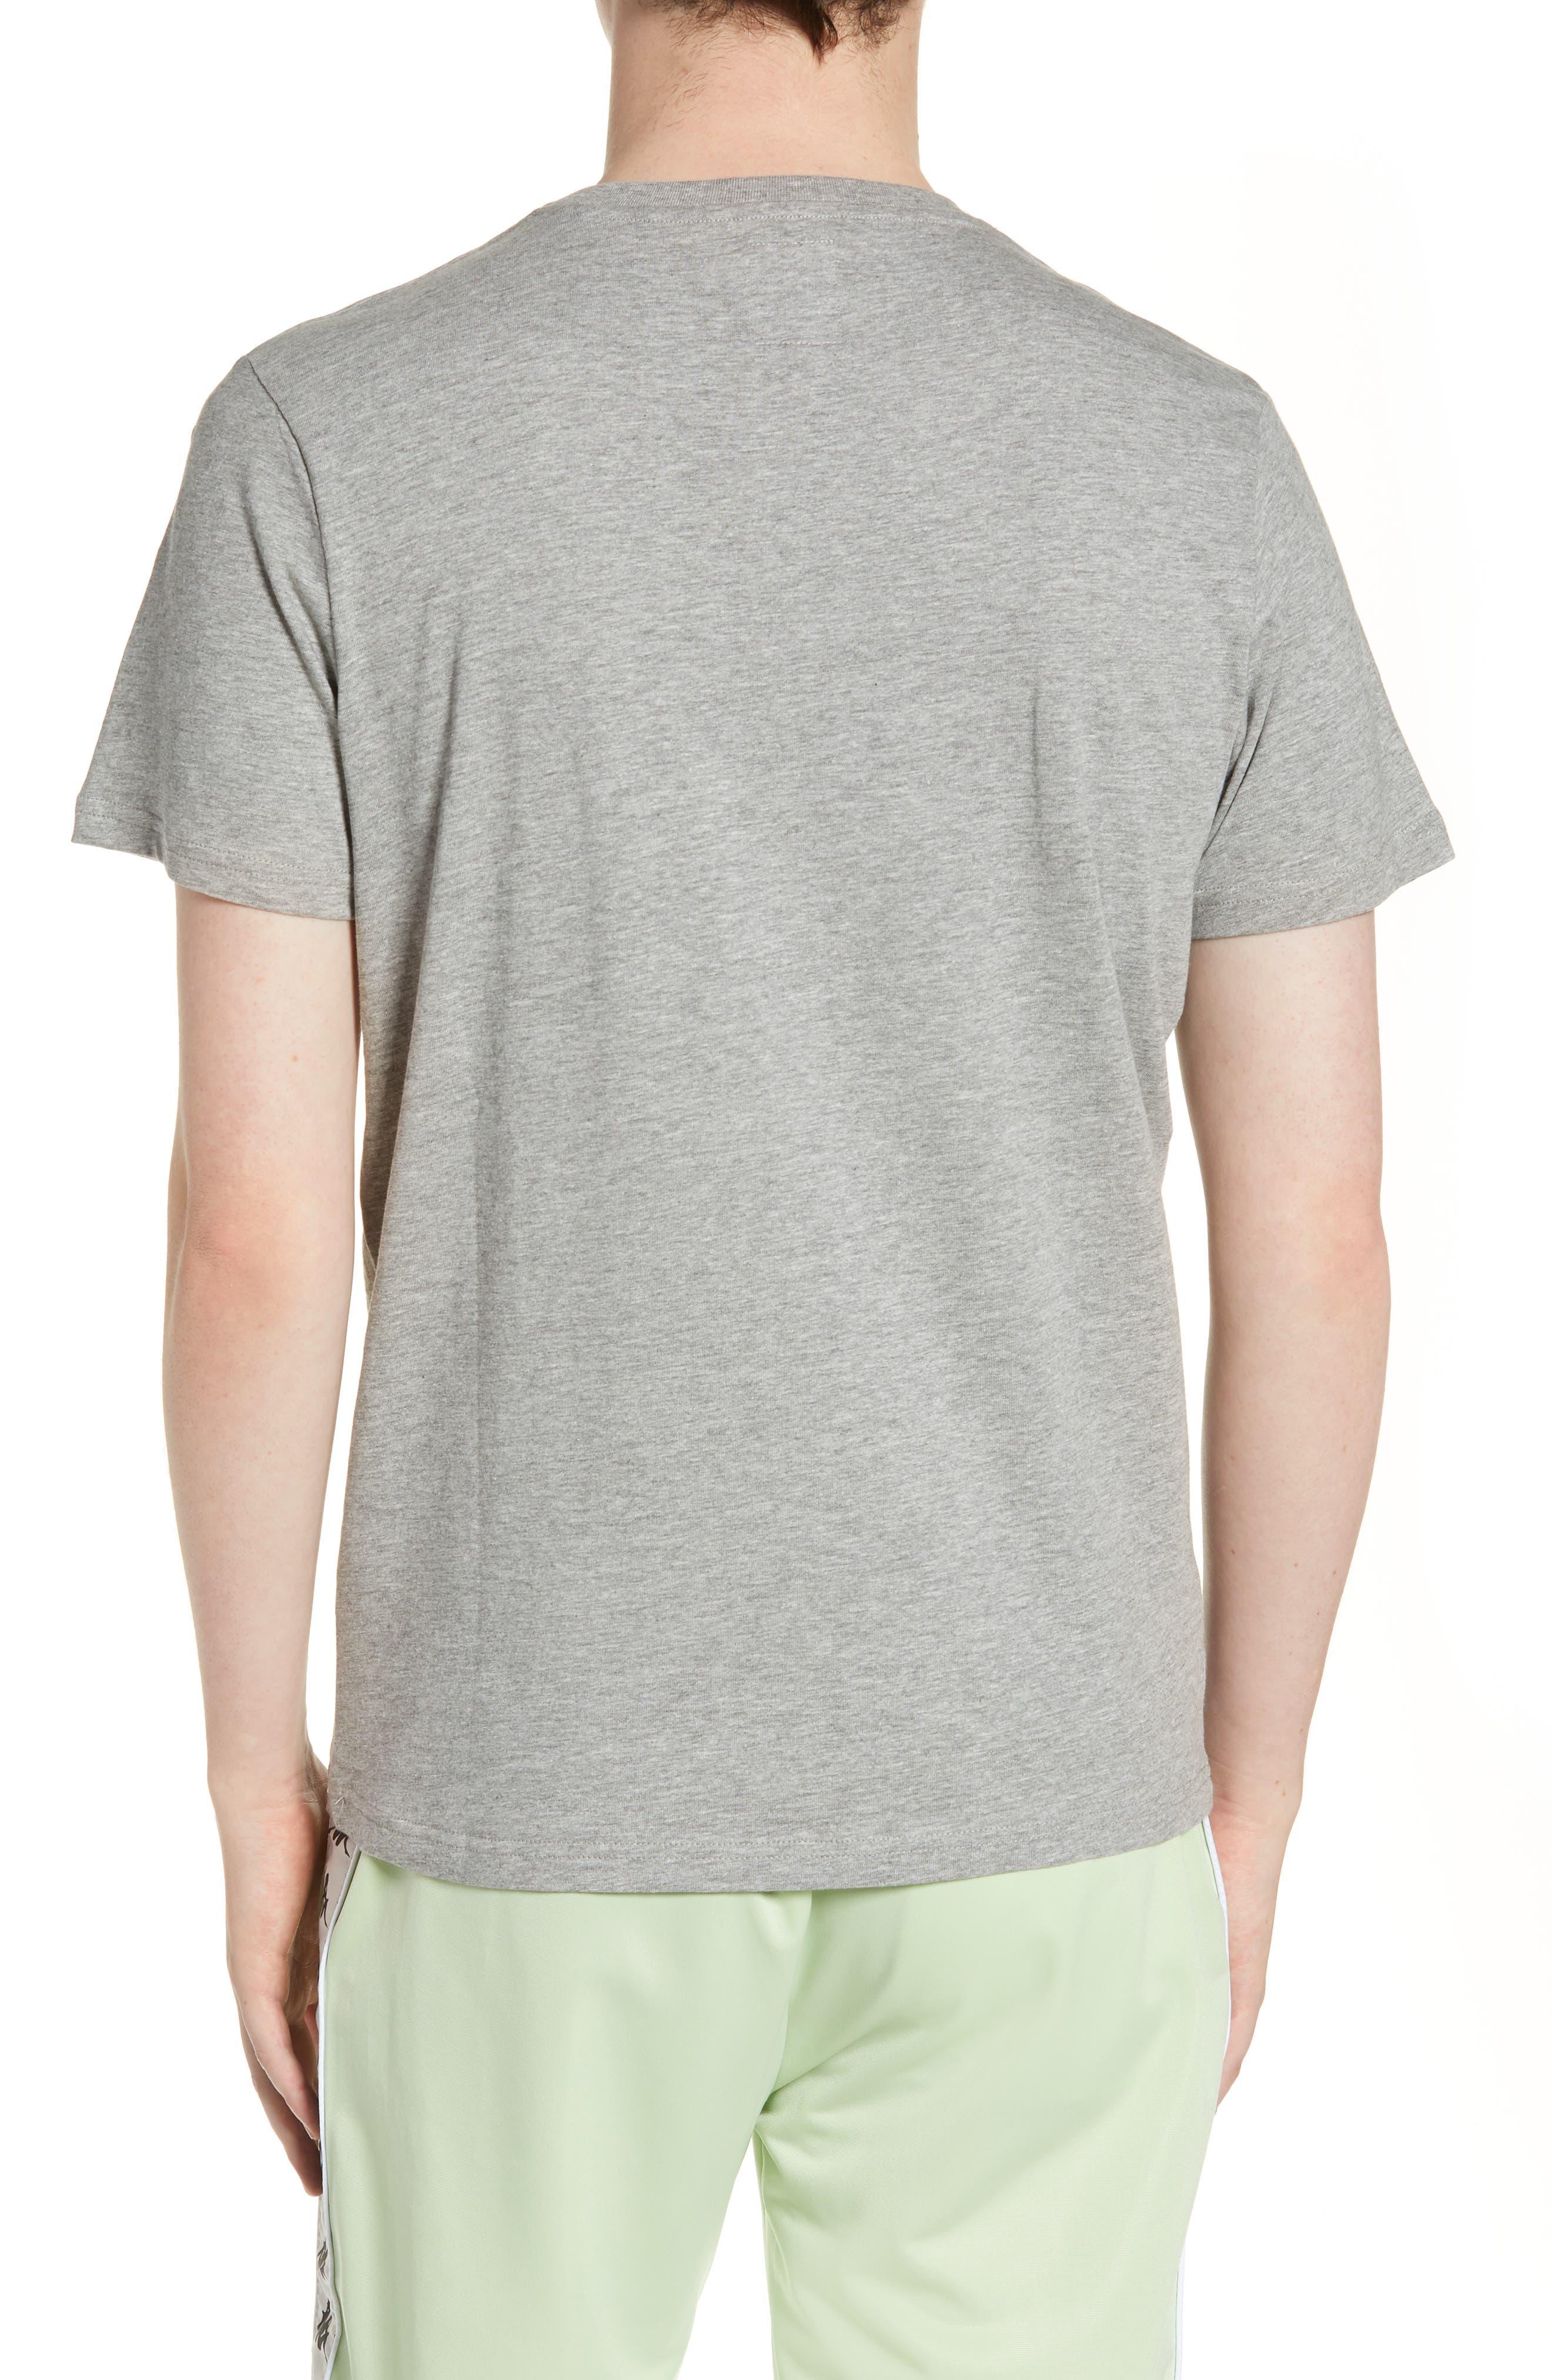 KAPPA,                             Estessi Graphic T-Shirt,                             Alternate thumbnail 2, color,                             HEATHER GREY